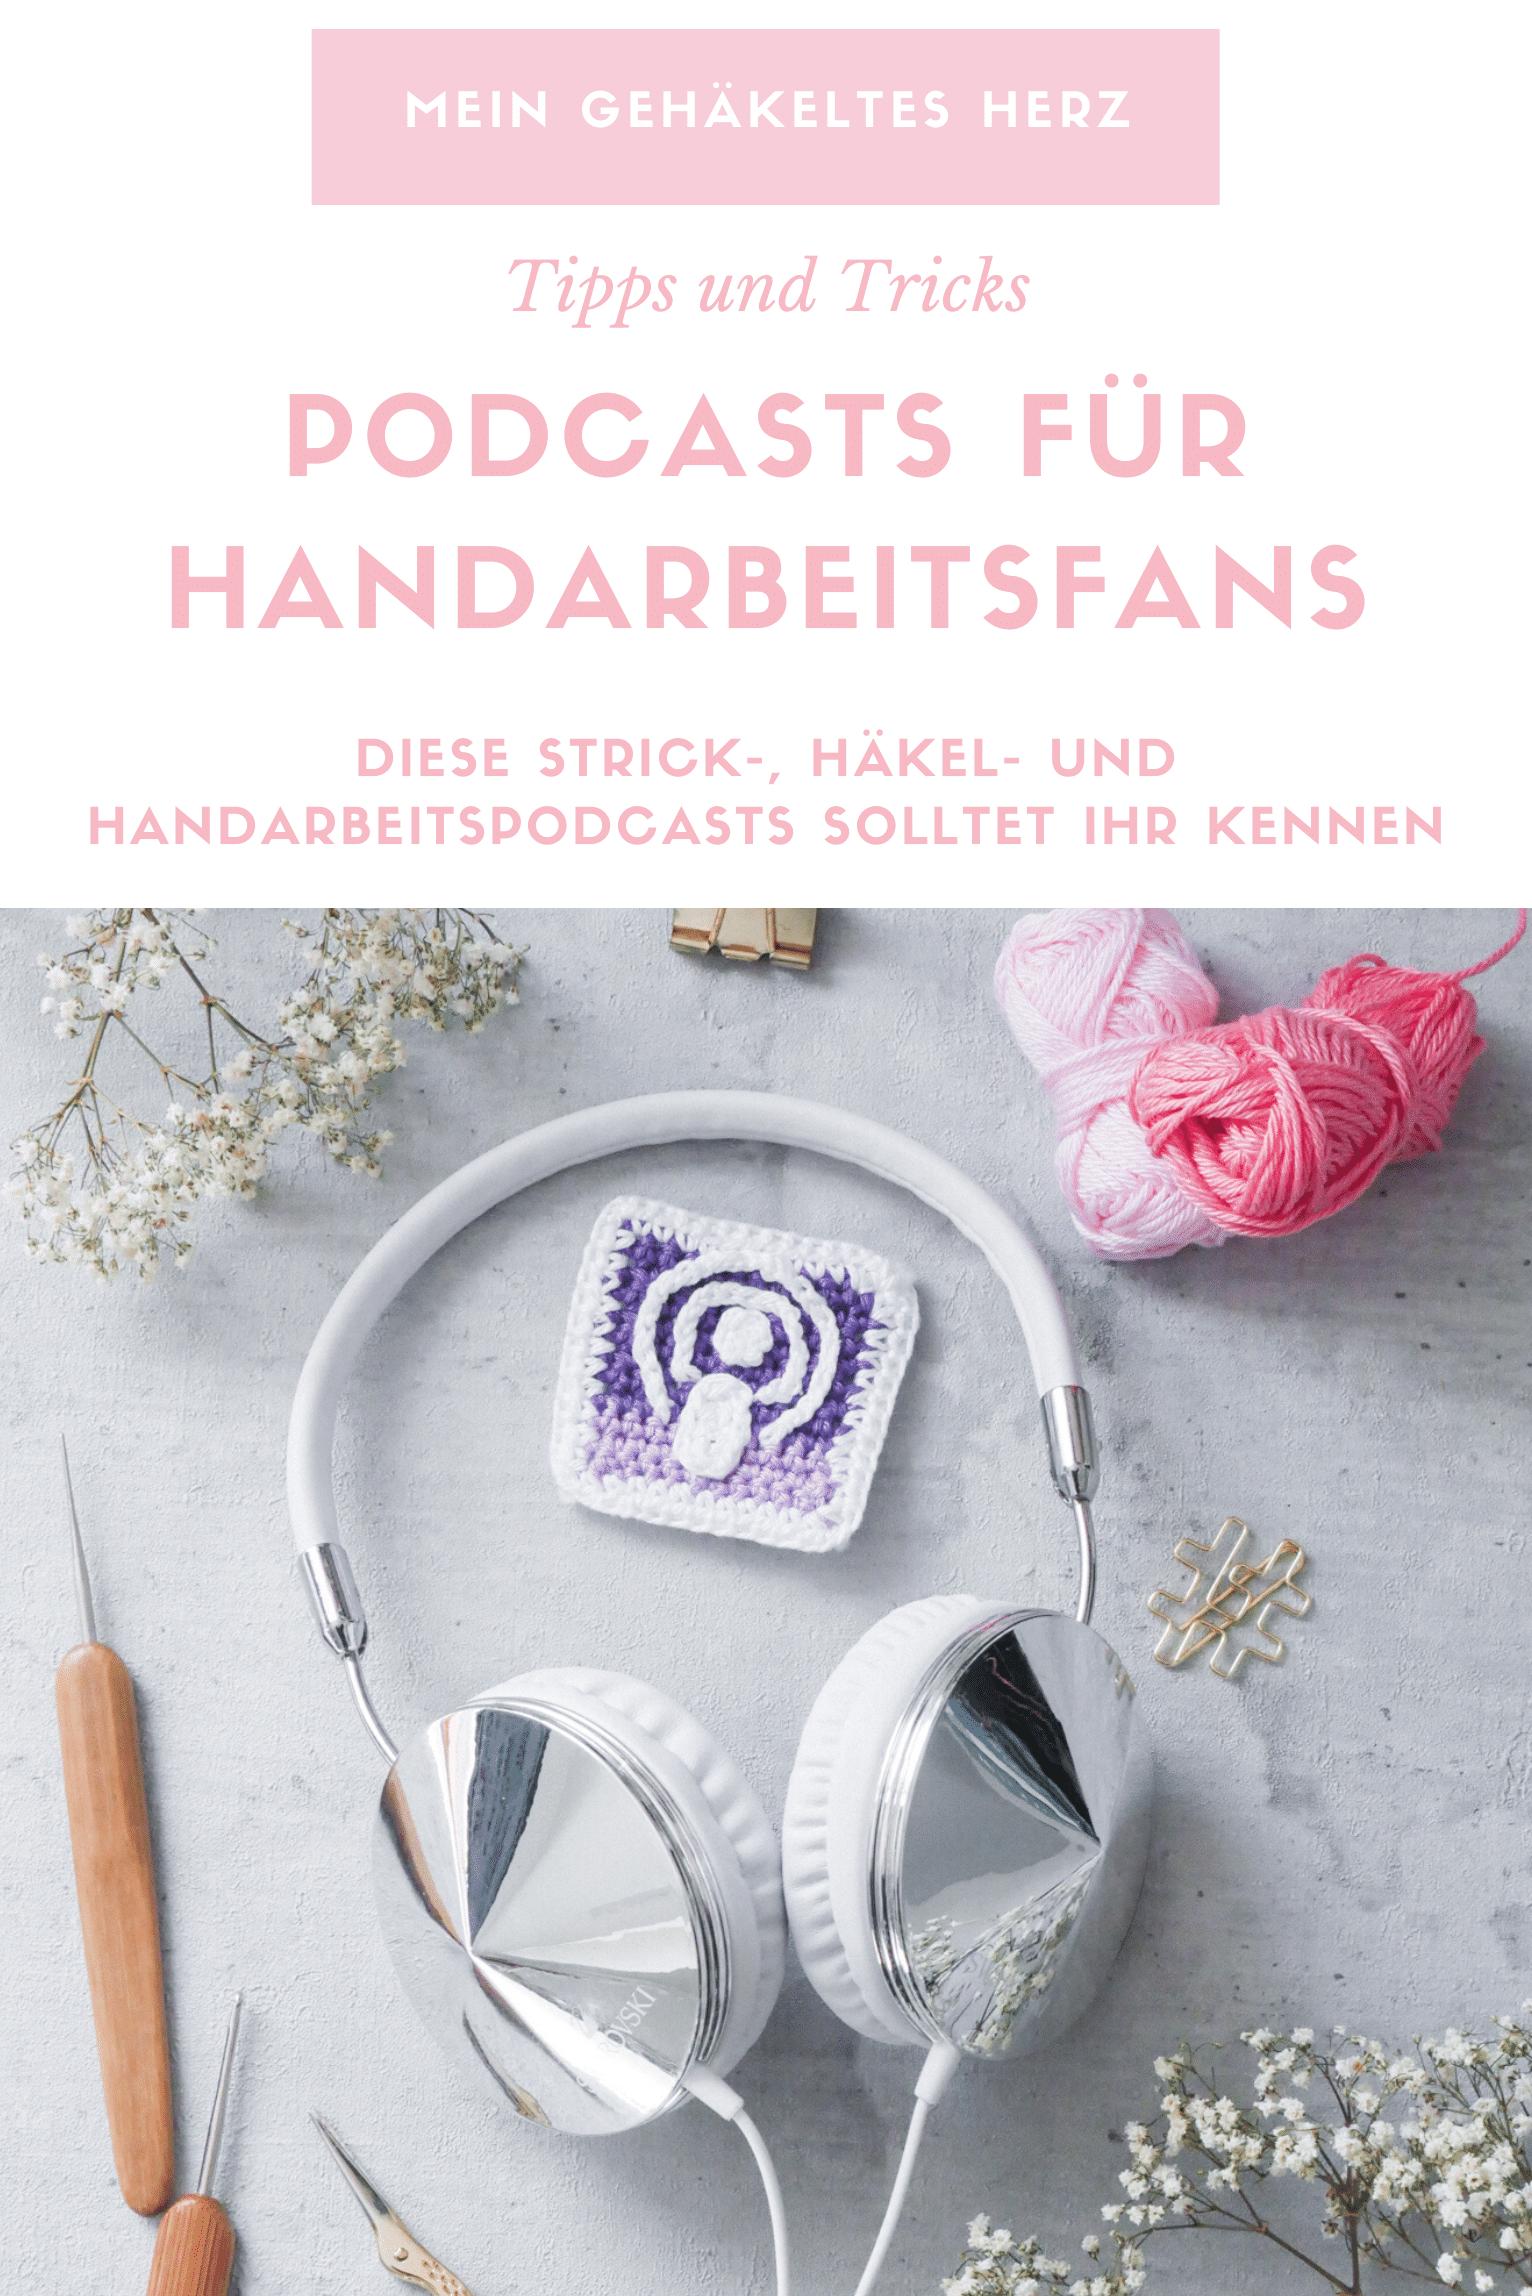 Kreative Podcasts zum Nachhören